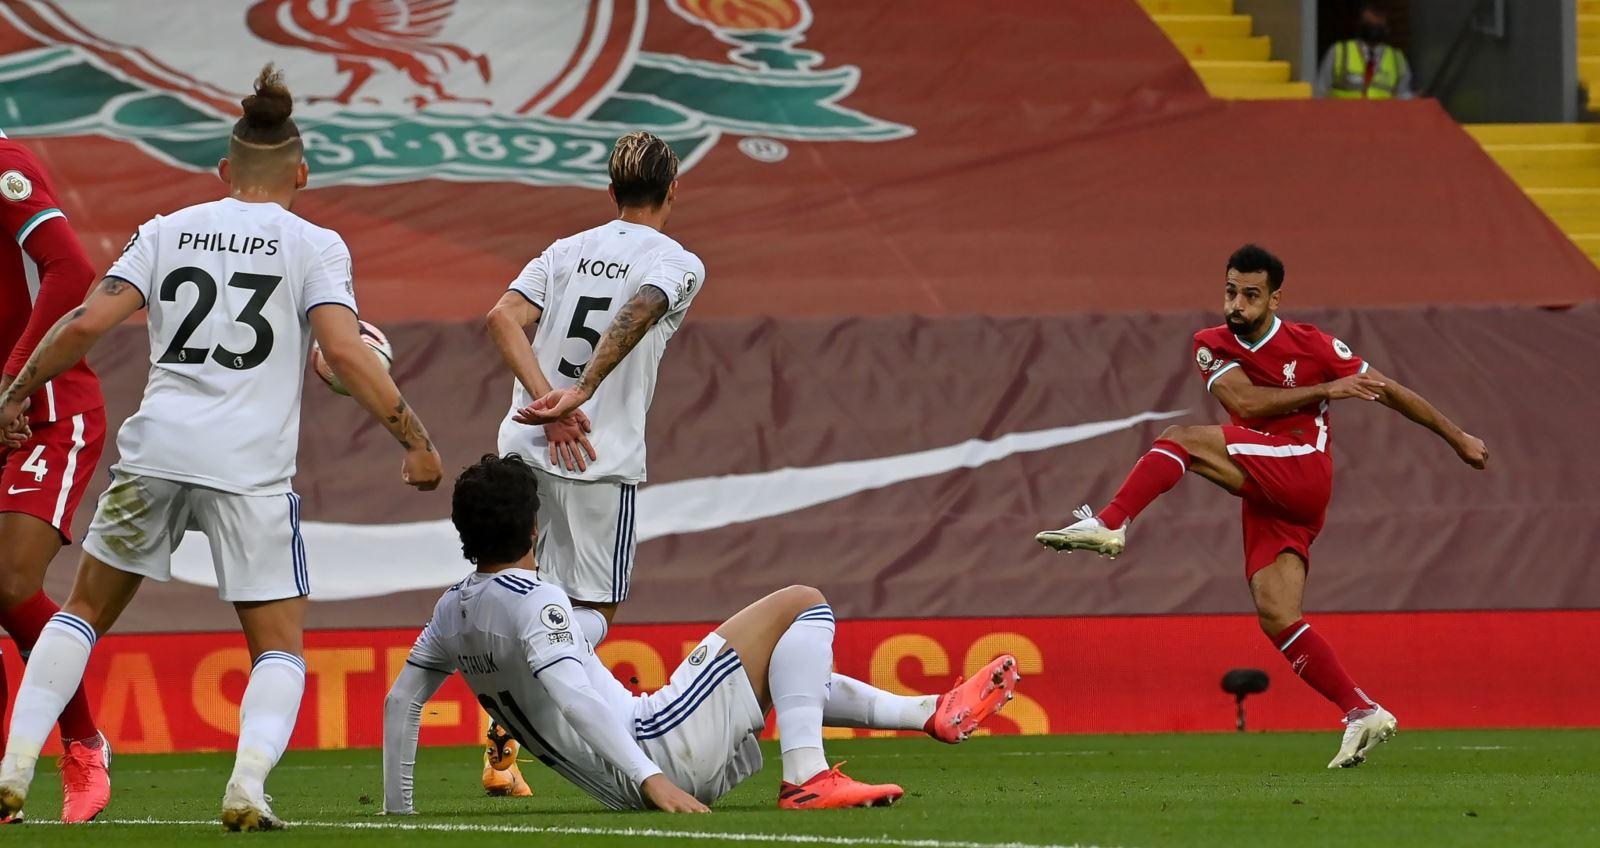 Liverpool vs Leeds United, Liverpool, Leeds United, kết quả bóng đá, bóng đá, bong da, liverpool, leeds united, salah, mohamed salah